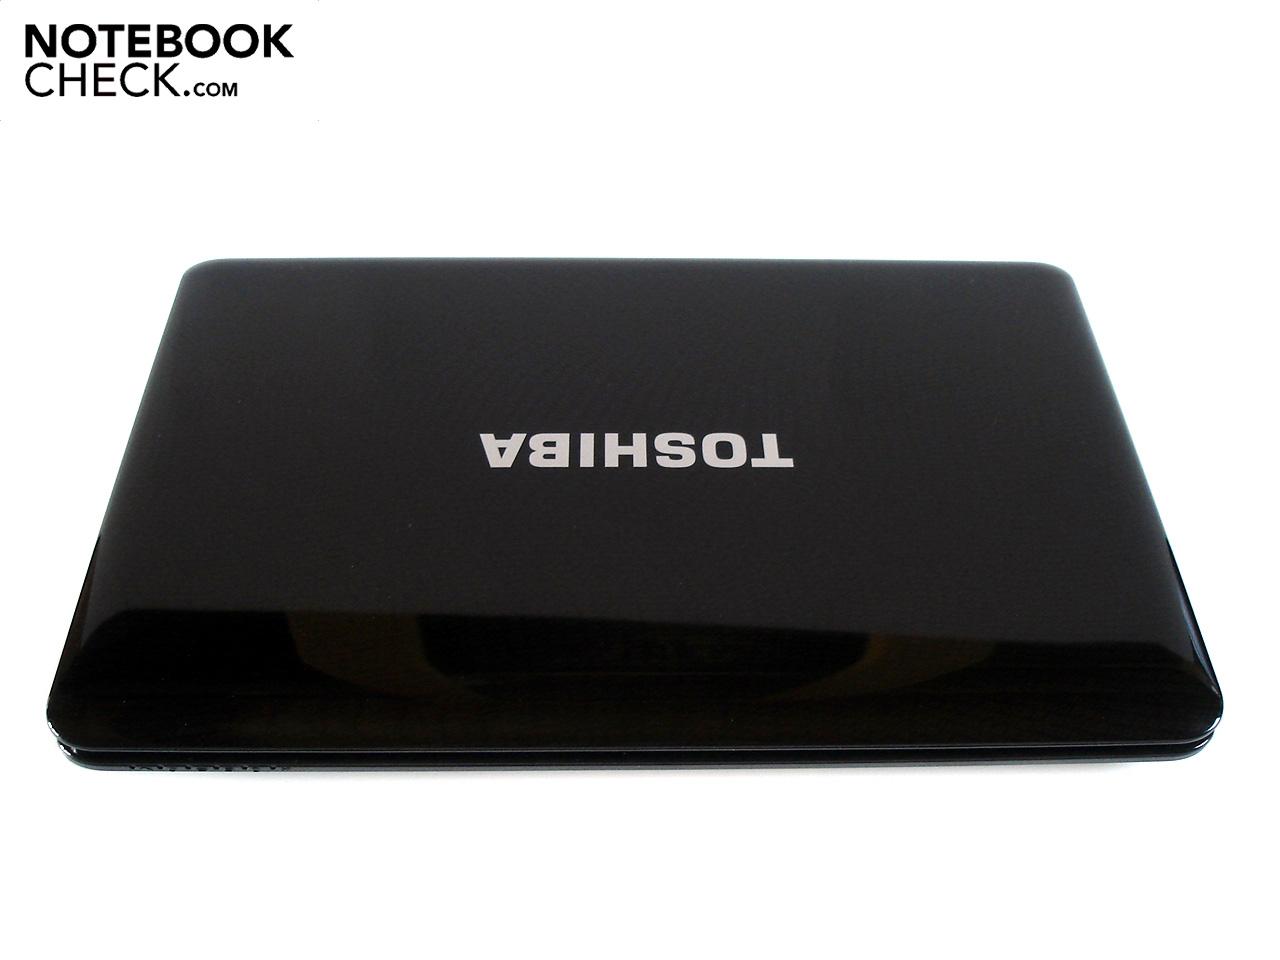 Toshiba tsstcorp cddvdw ts-l633c